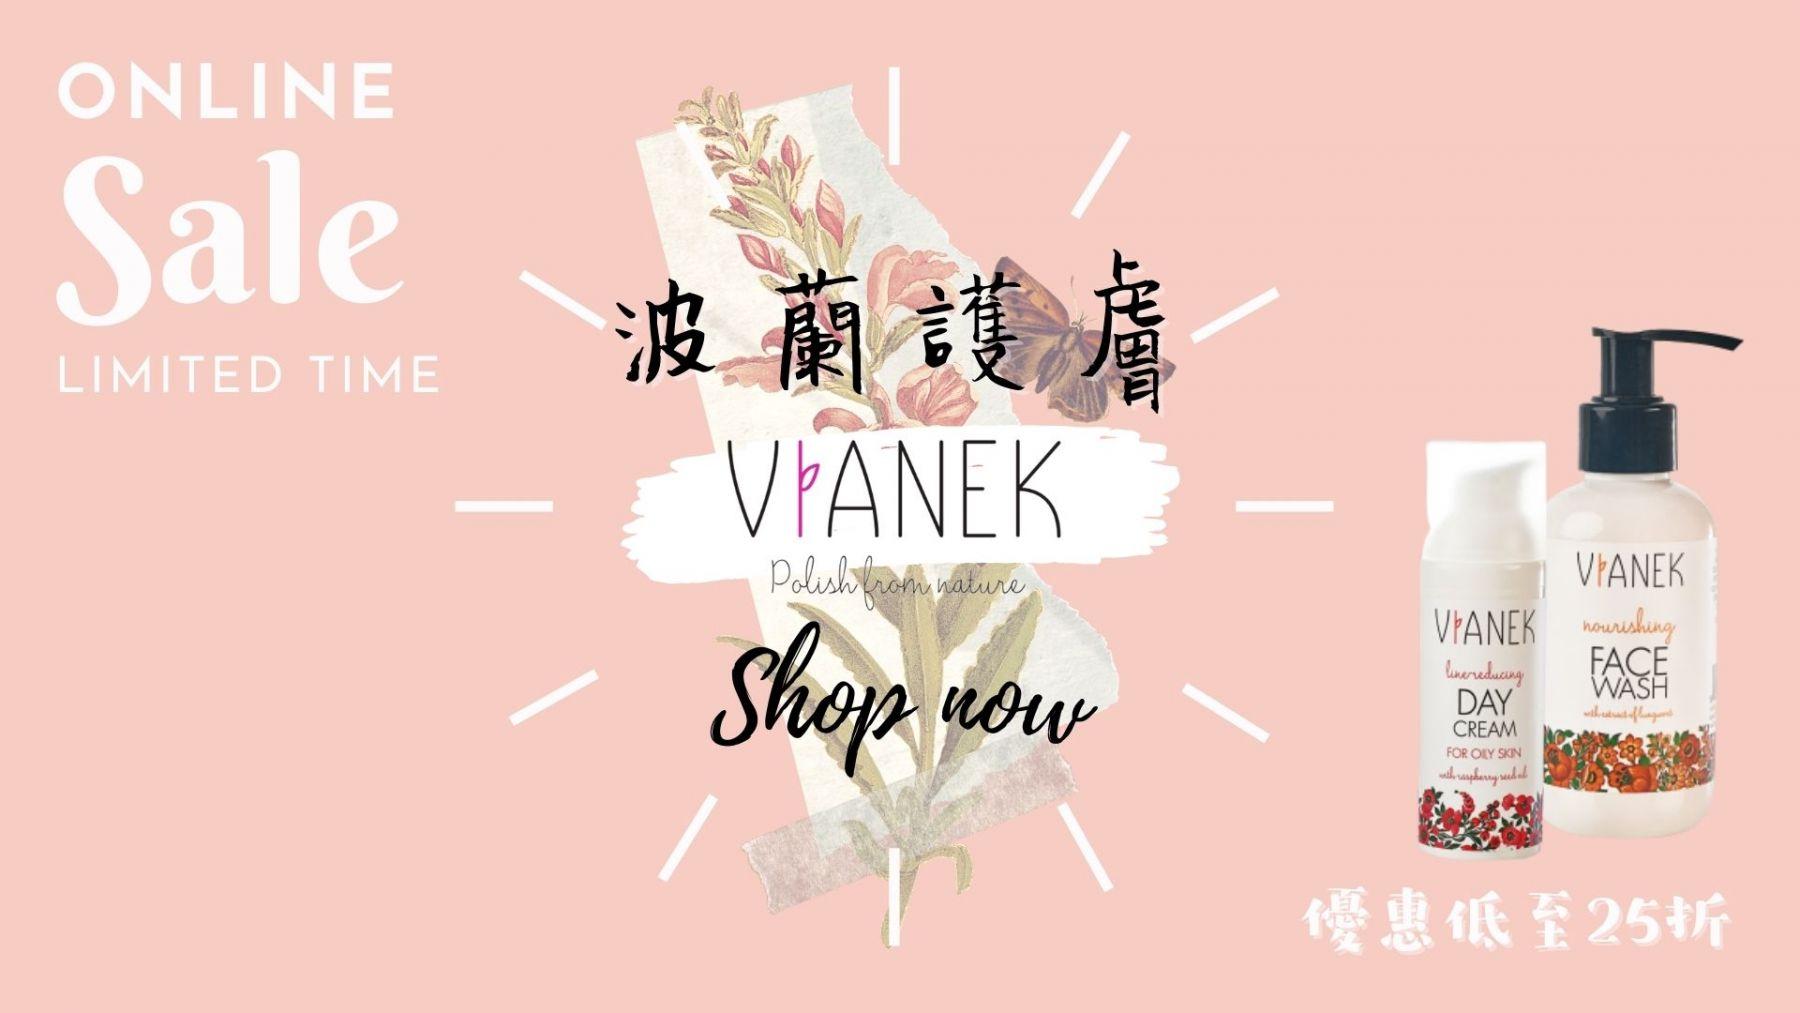 Vianek Promotion